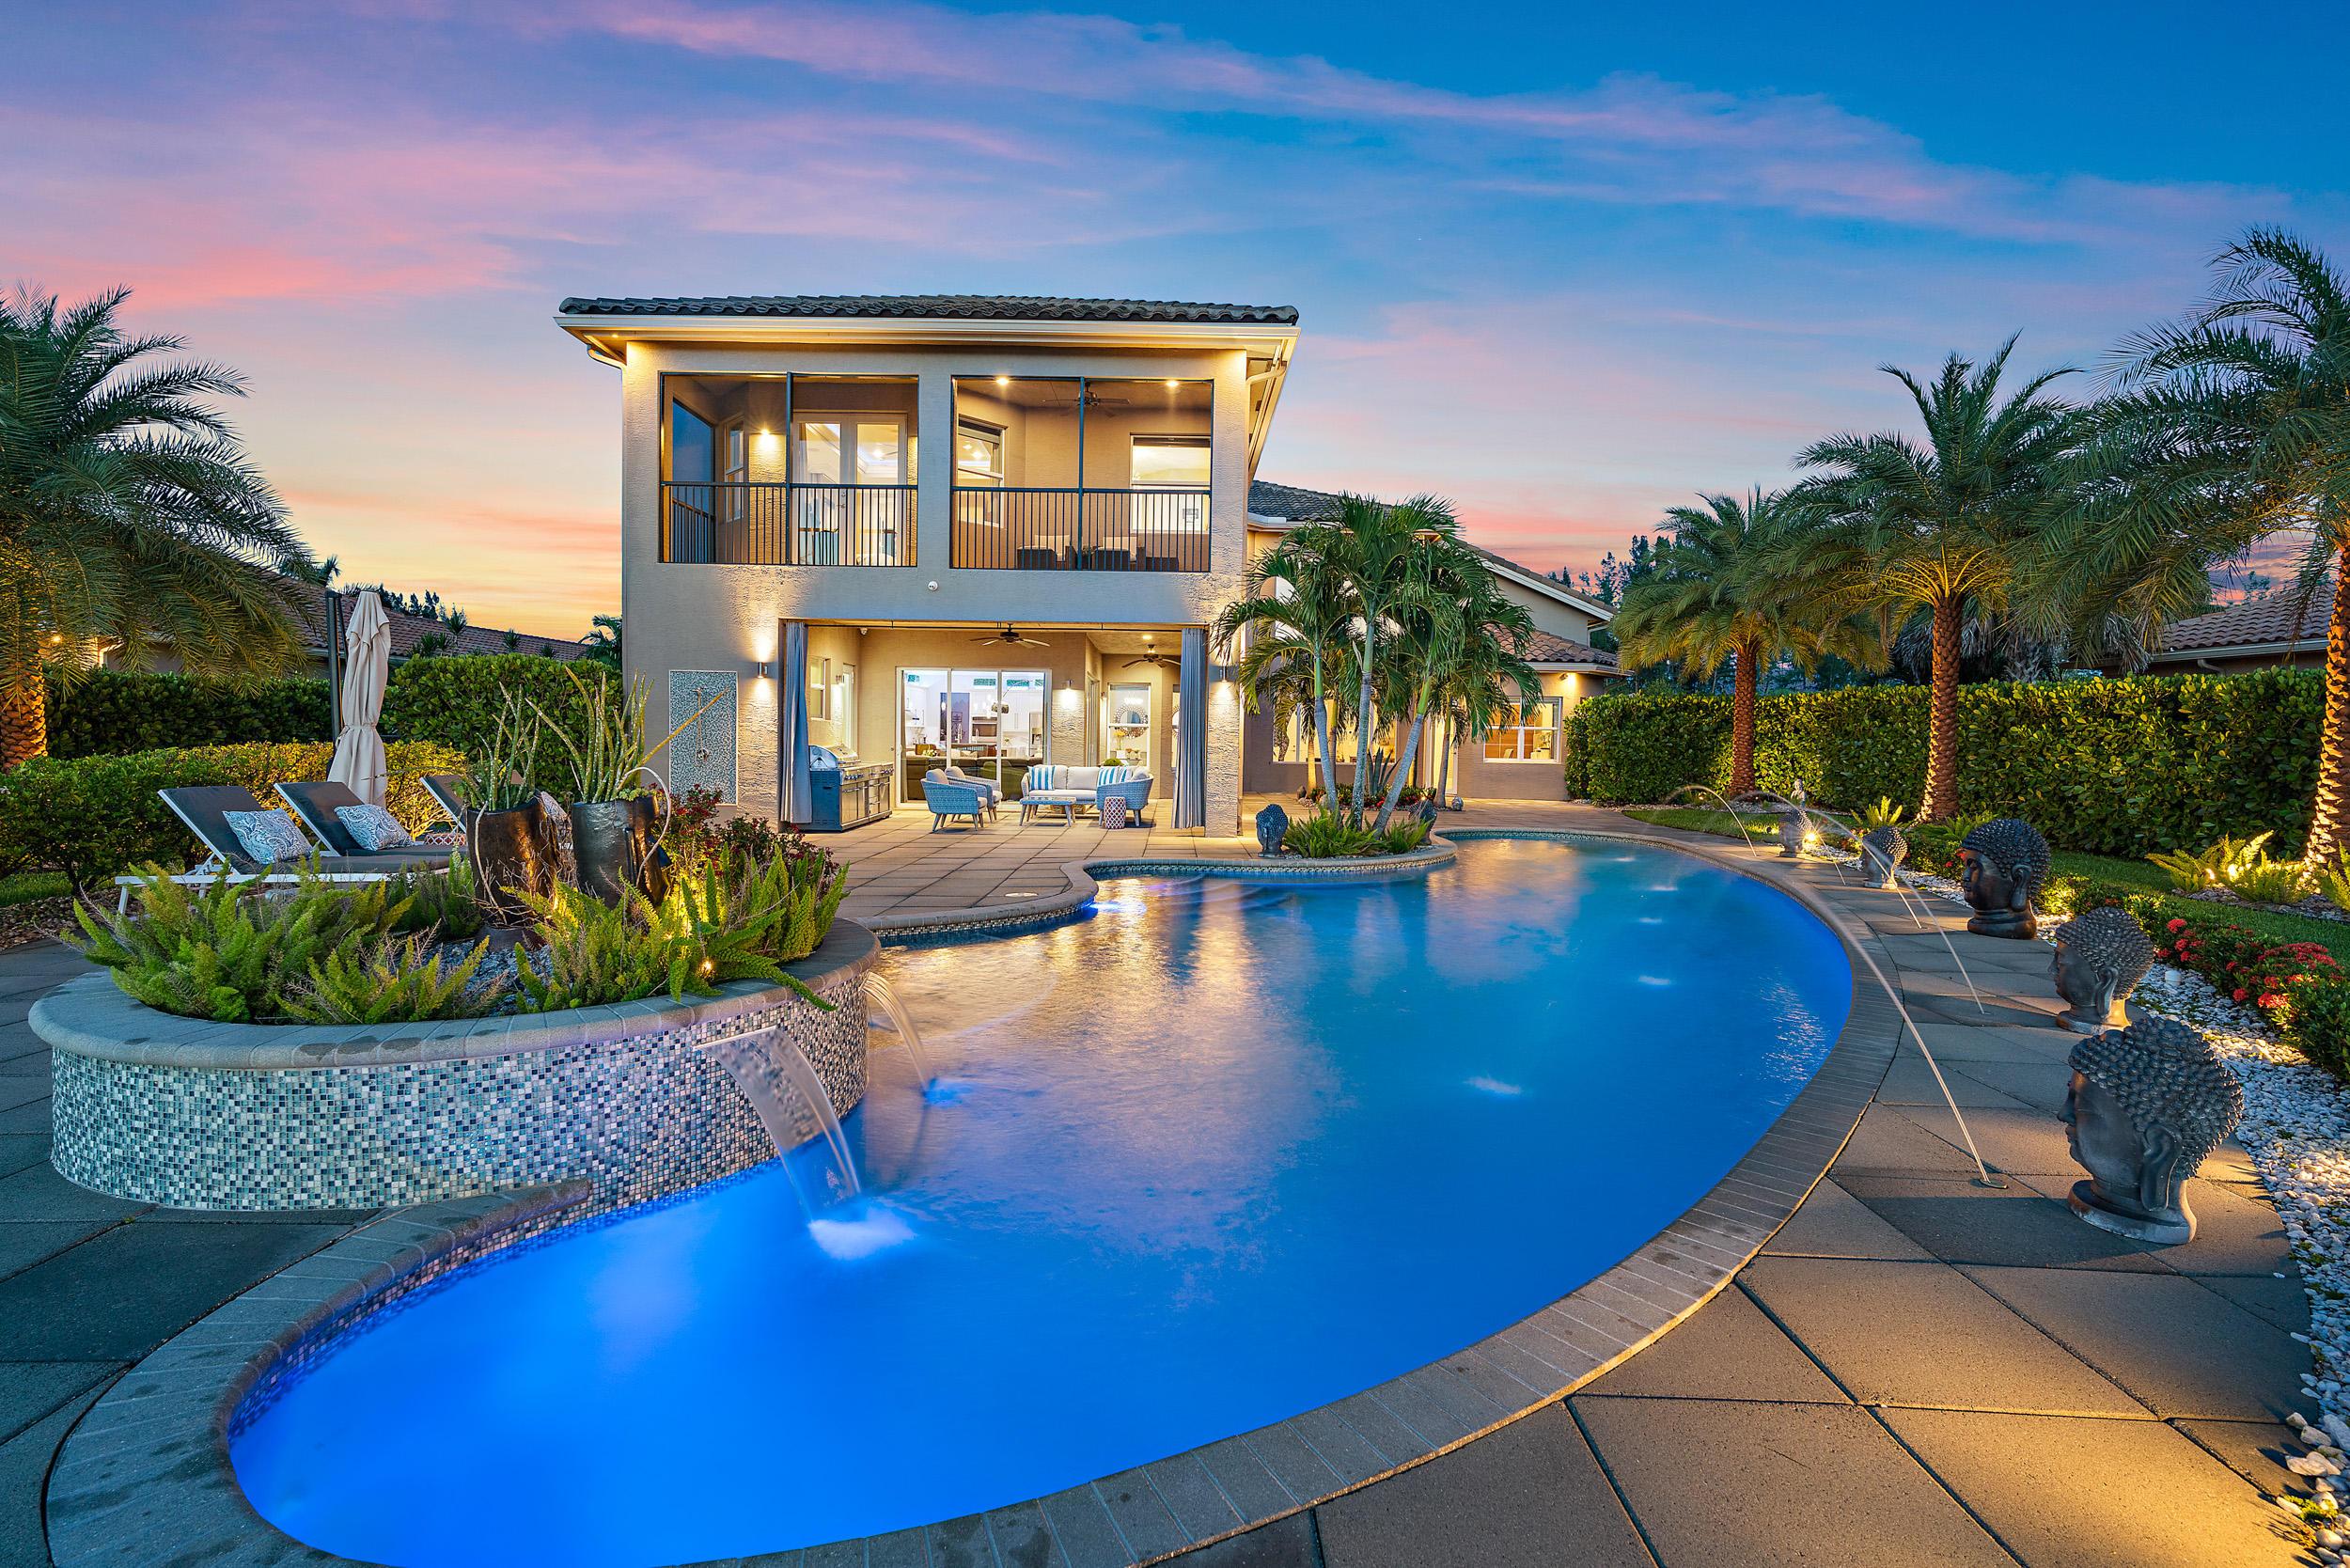 Details for 7643 Maywood Crest Drive, Palm Beach Gardens, FL 33412